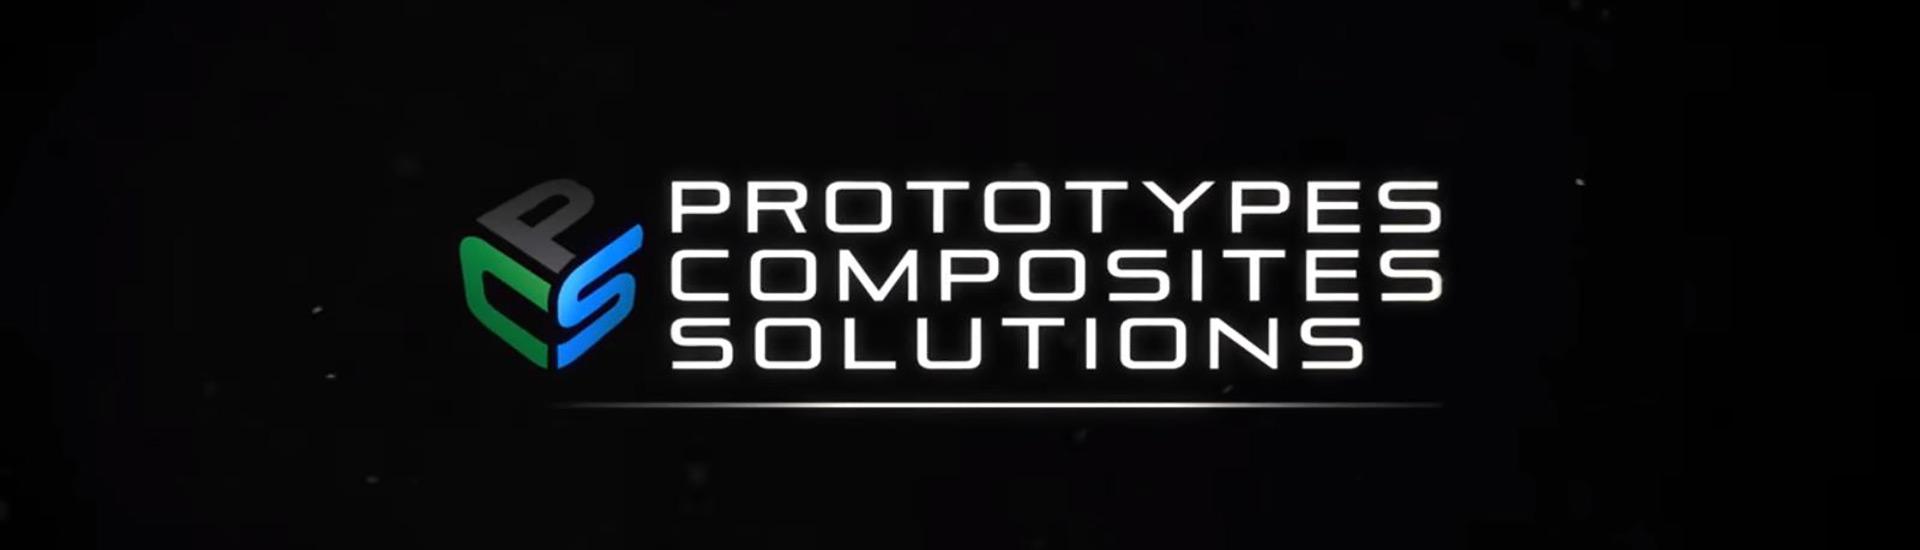 Logo prototypes composites solutions 2016